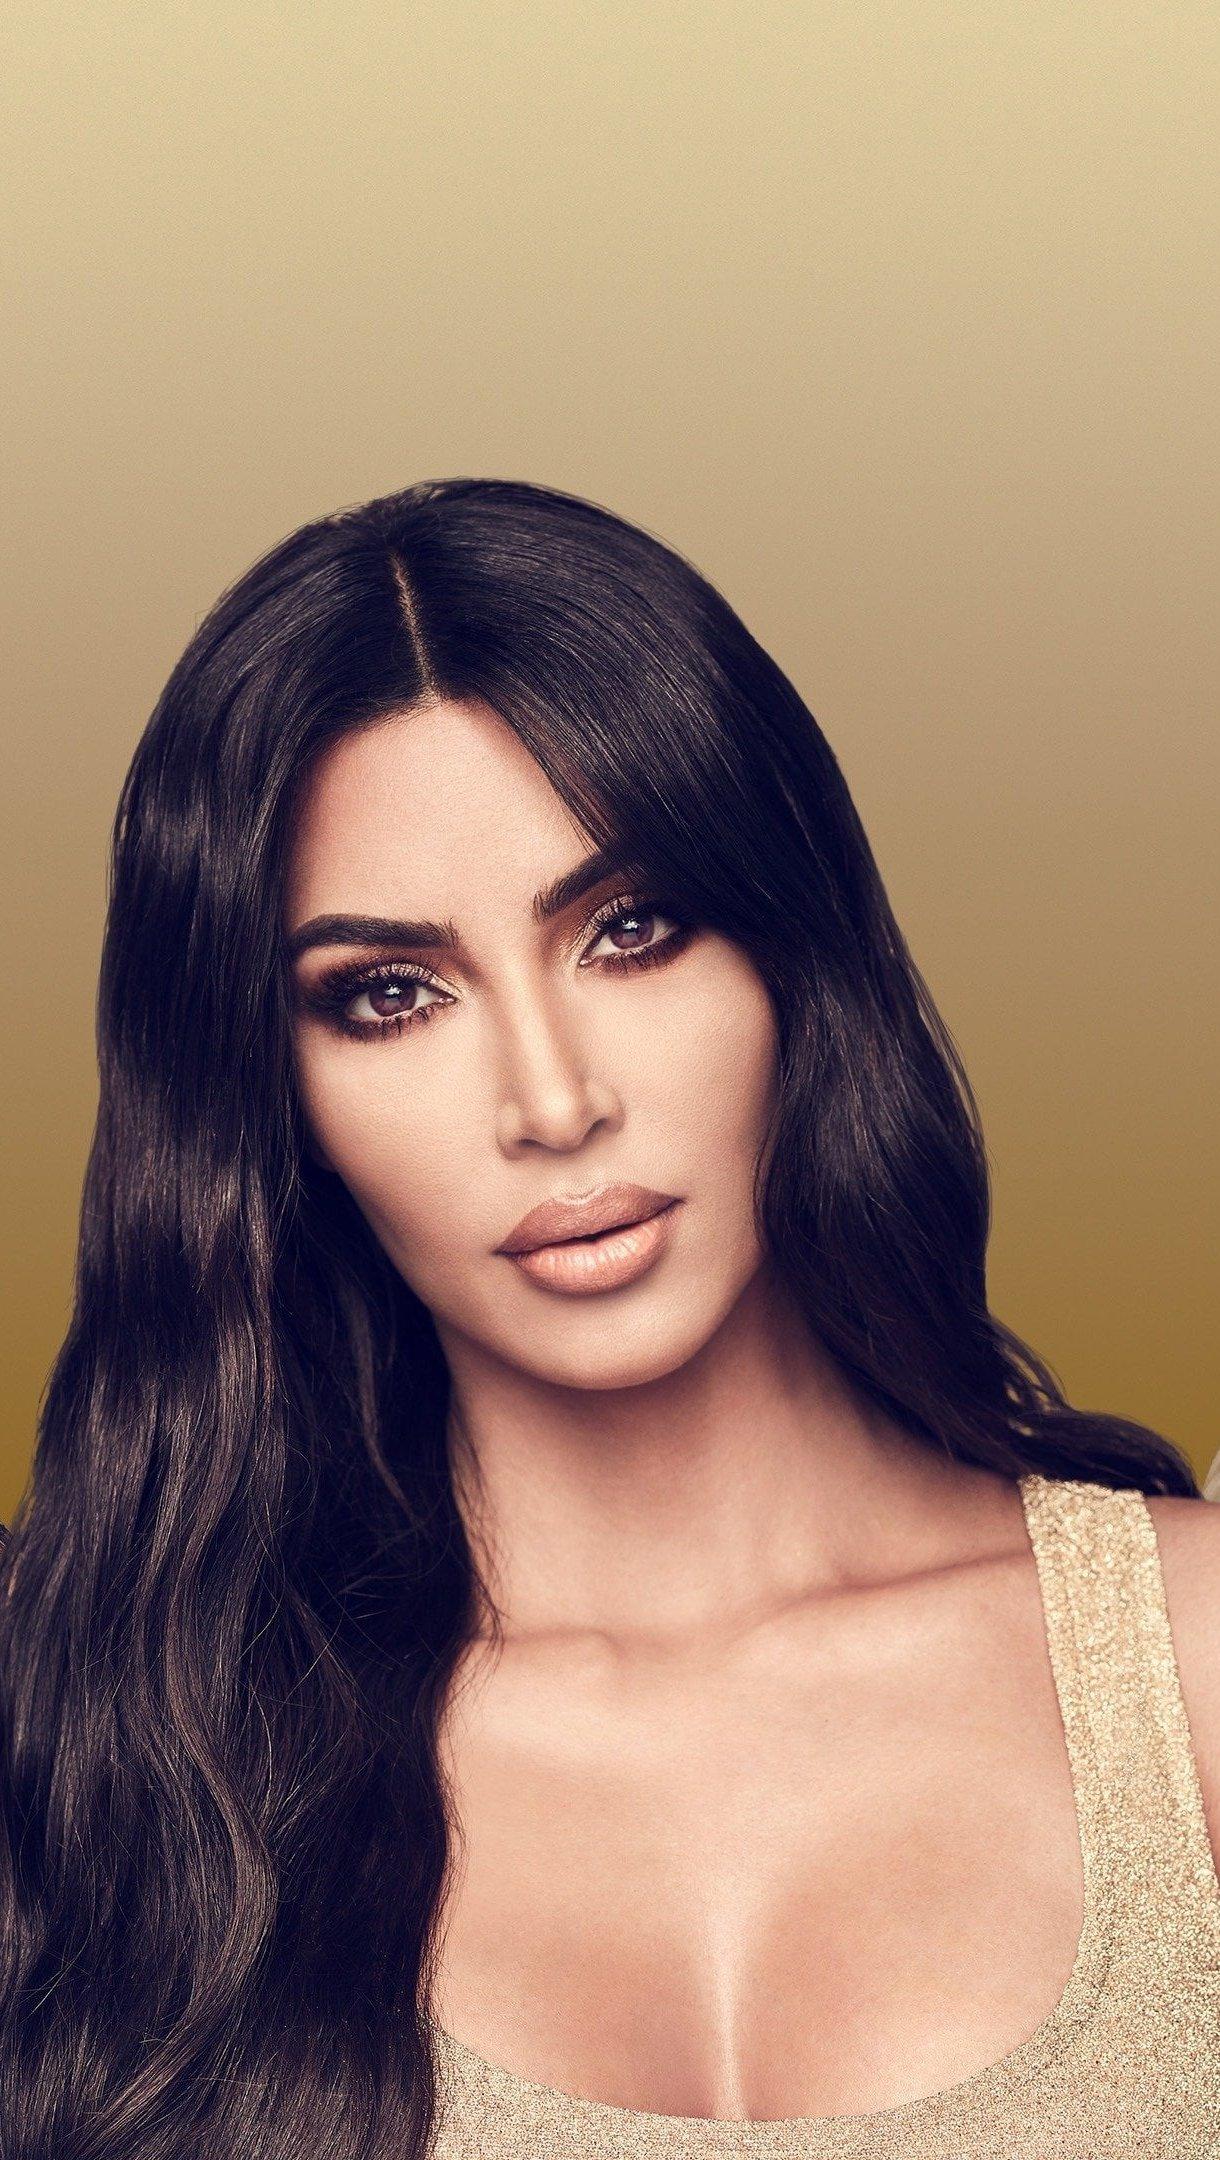 Fondos de pantalla Keeping up with the Kardashians Temporada 20 Vertical